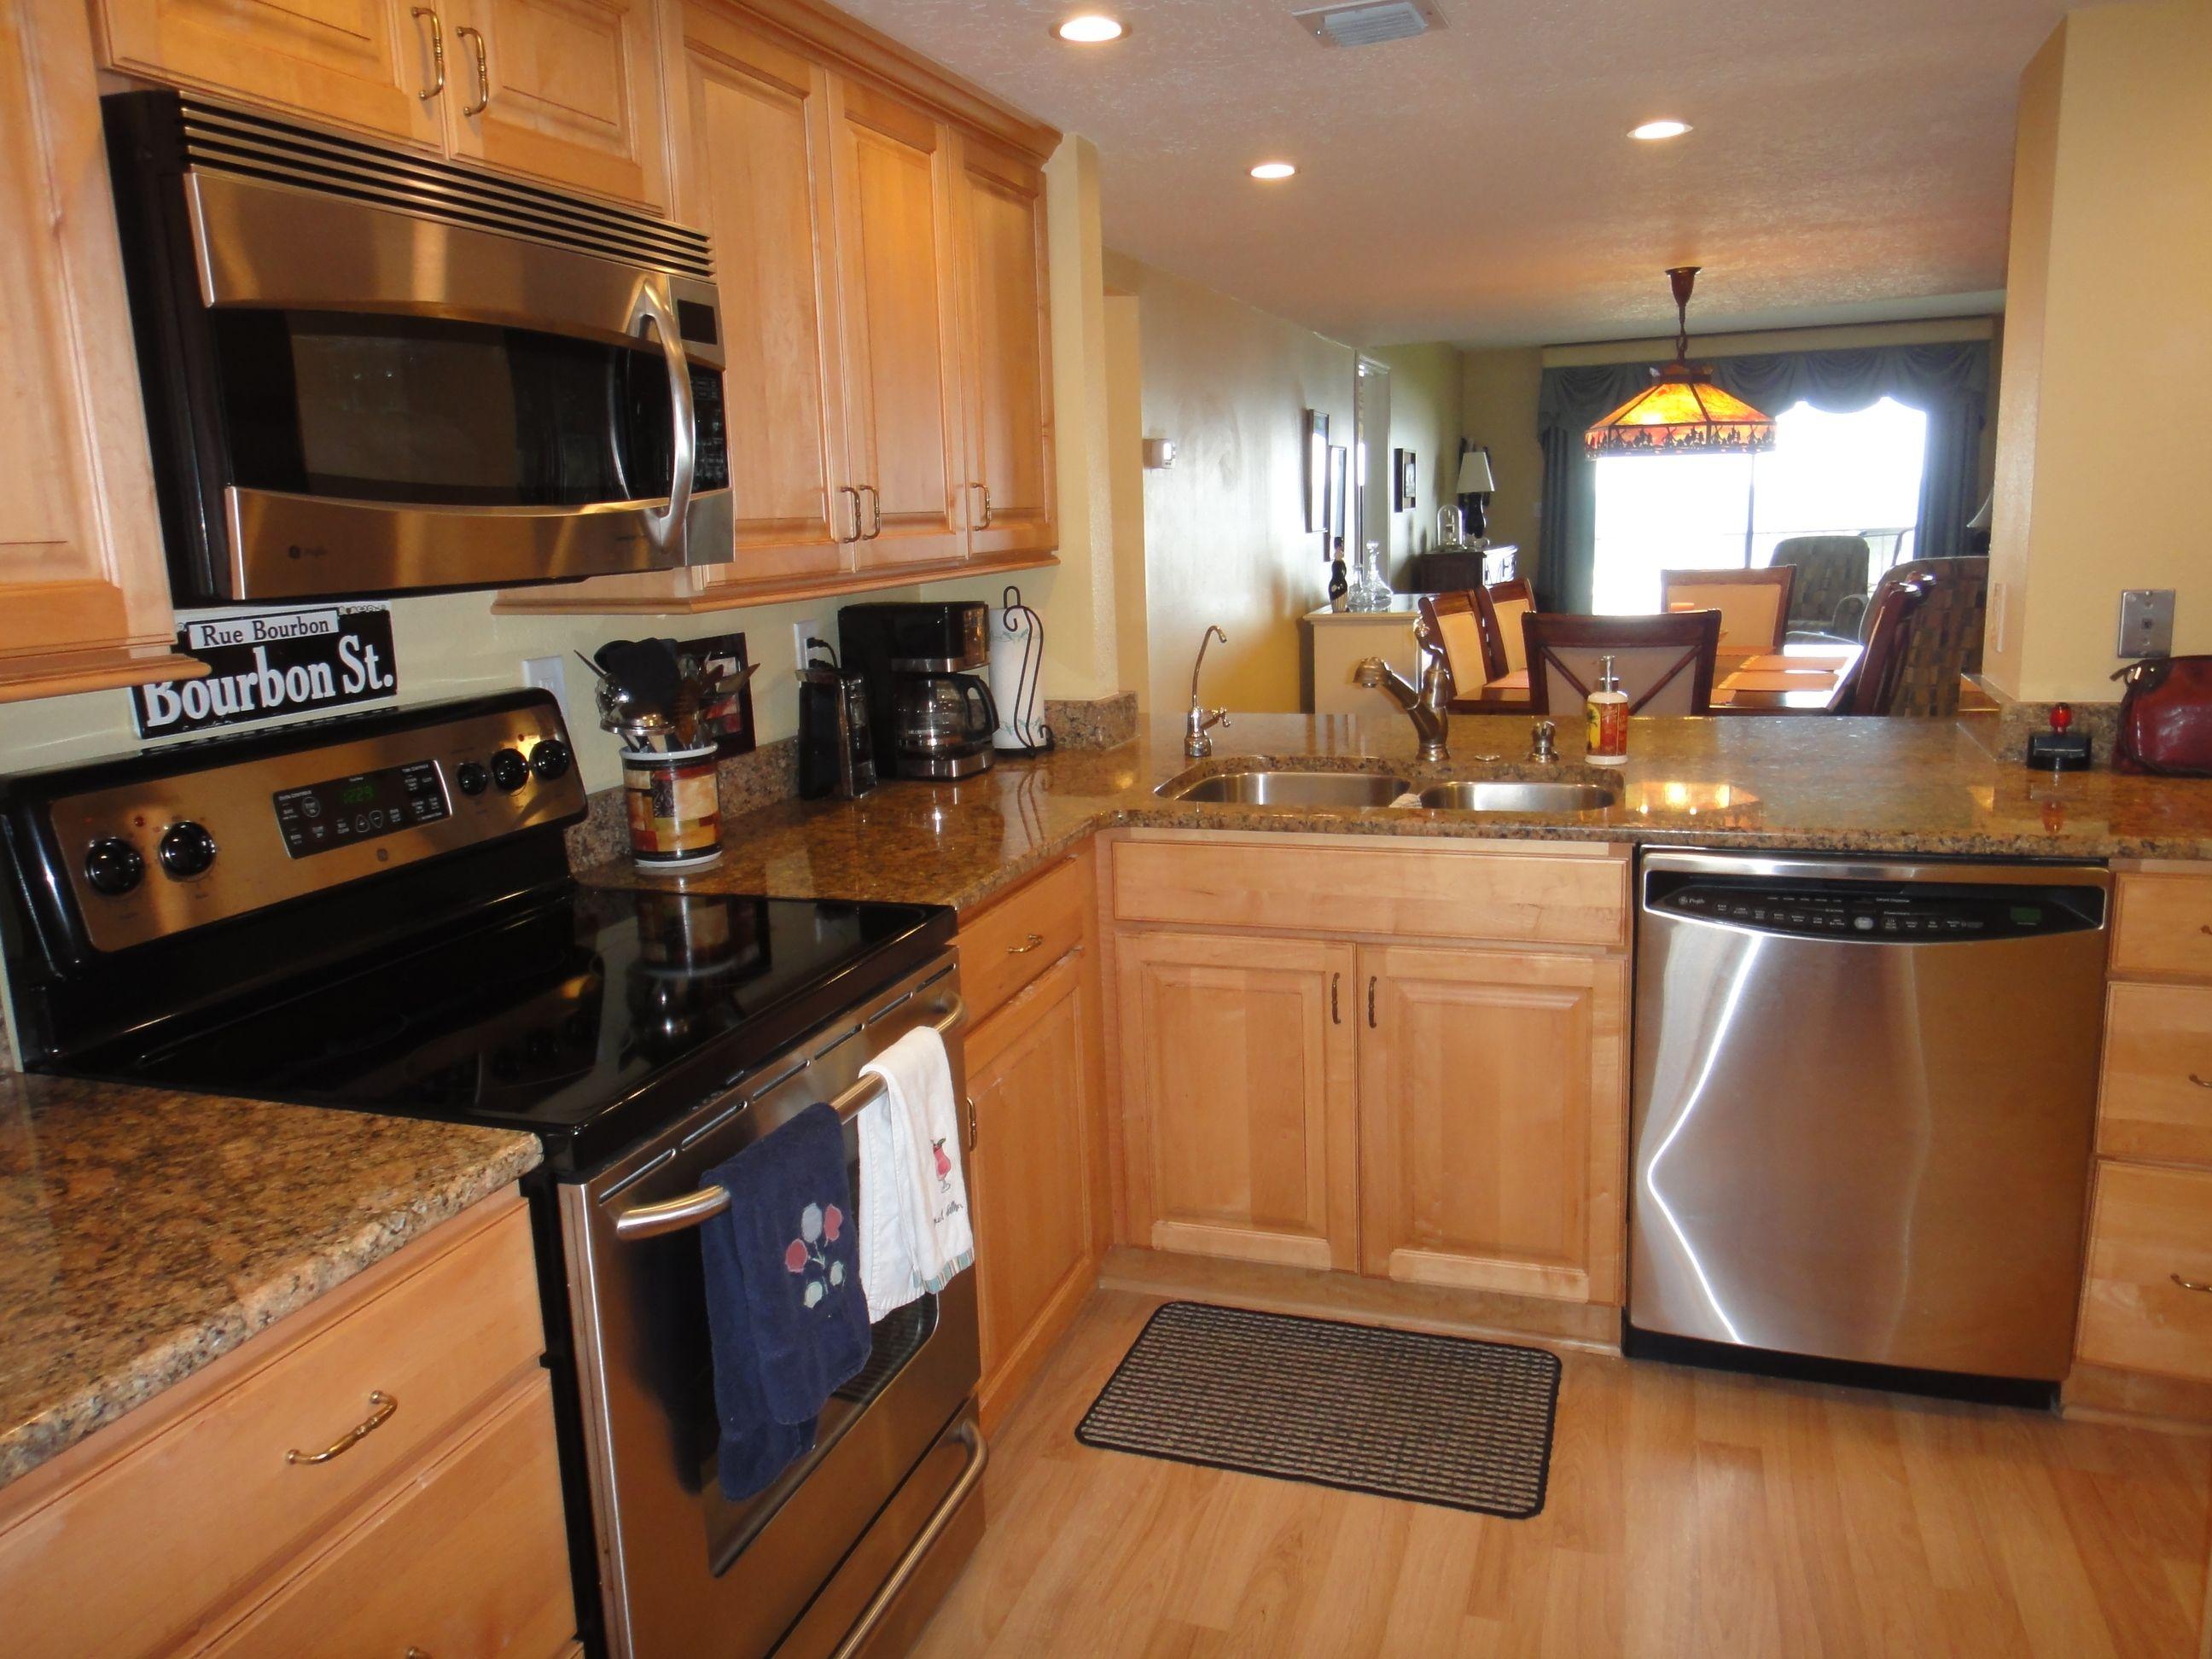 breathtaking kitchen with stainless steel appliances seaside realty windward east on kitchen appliances id=86512